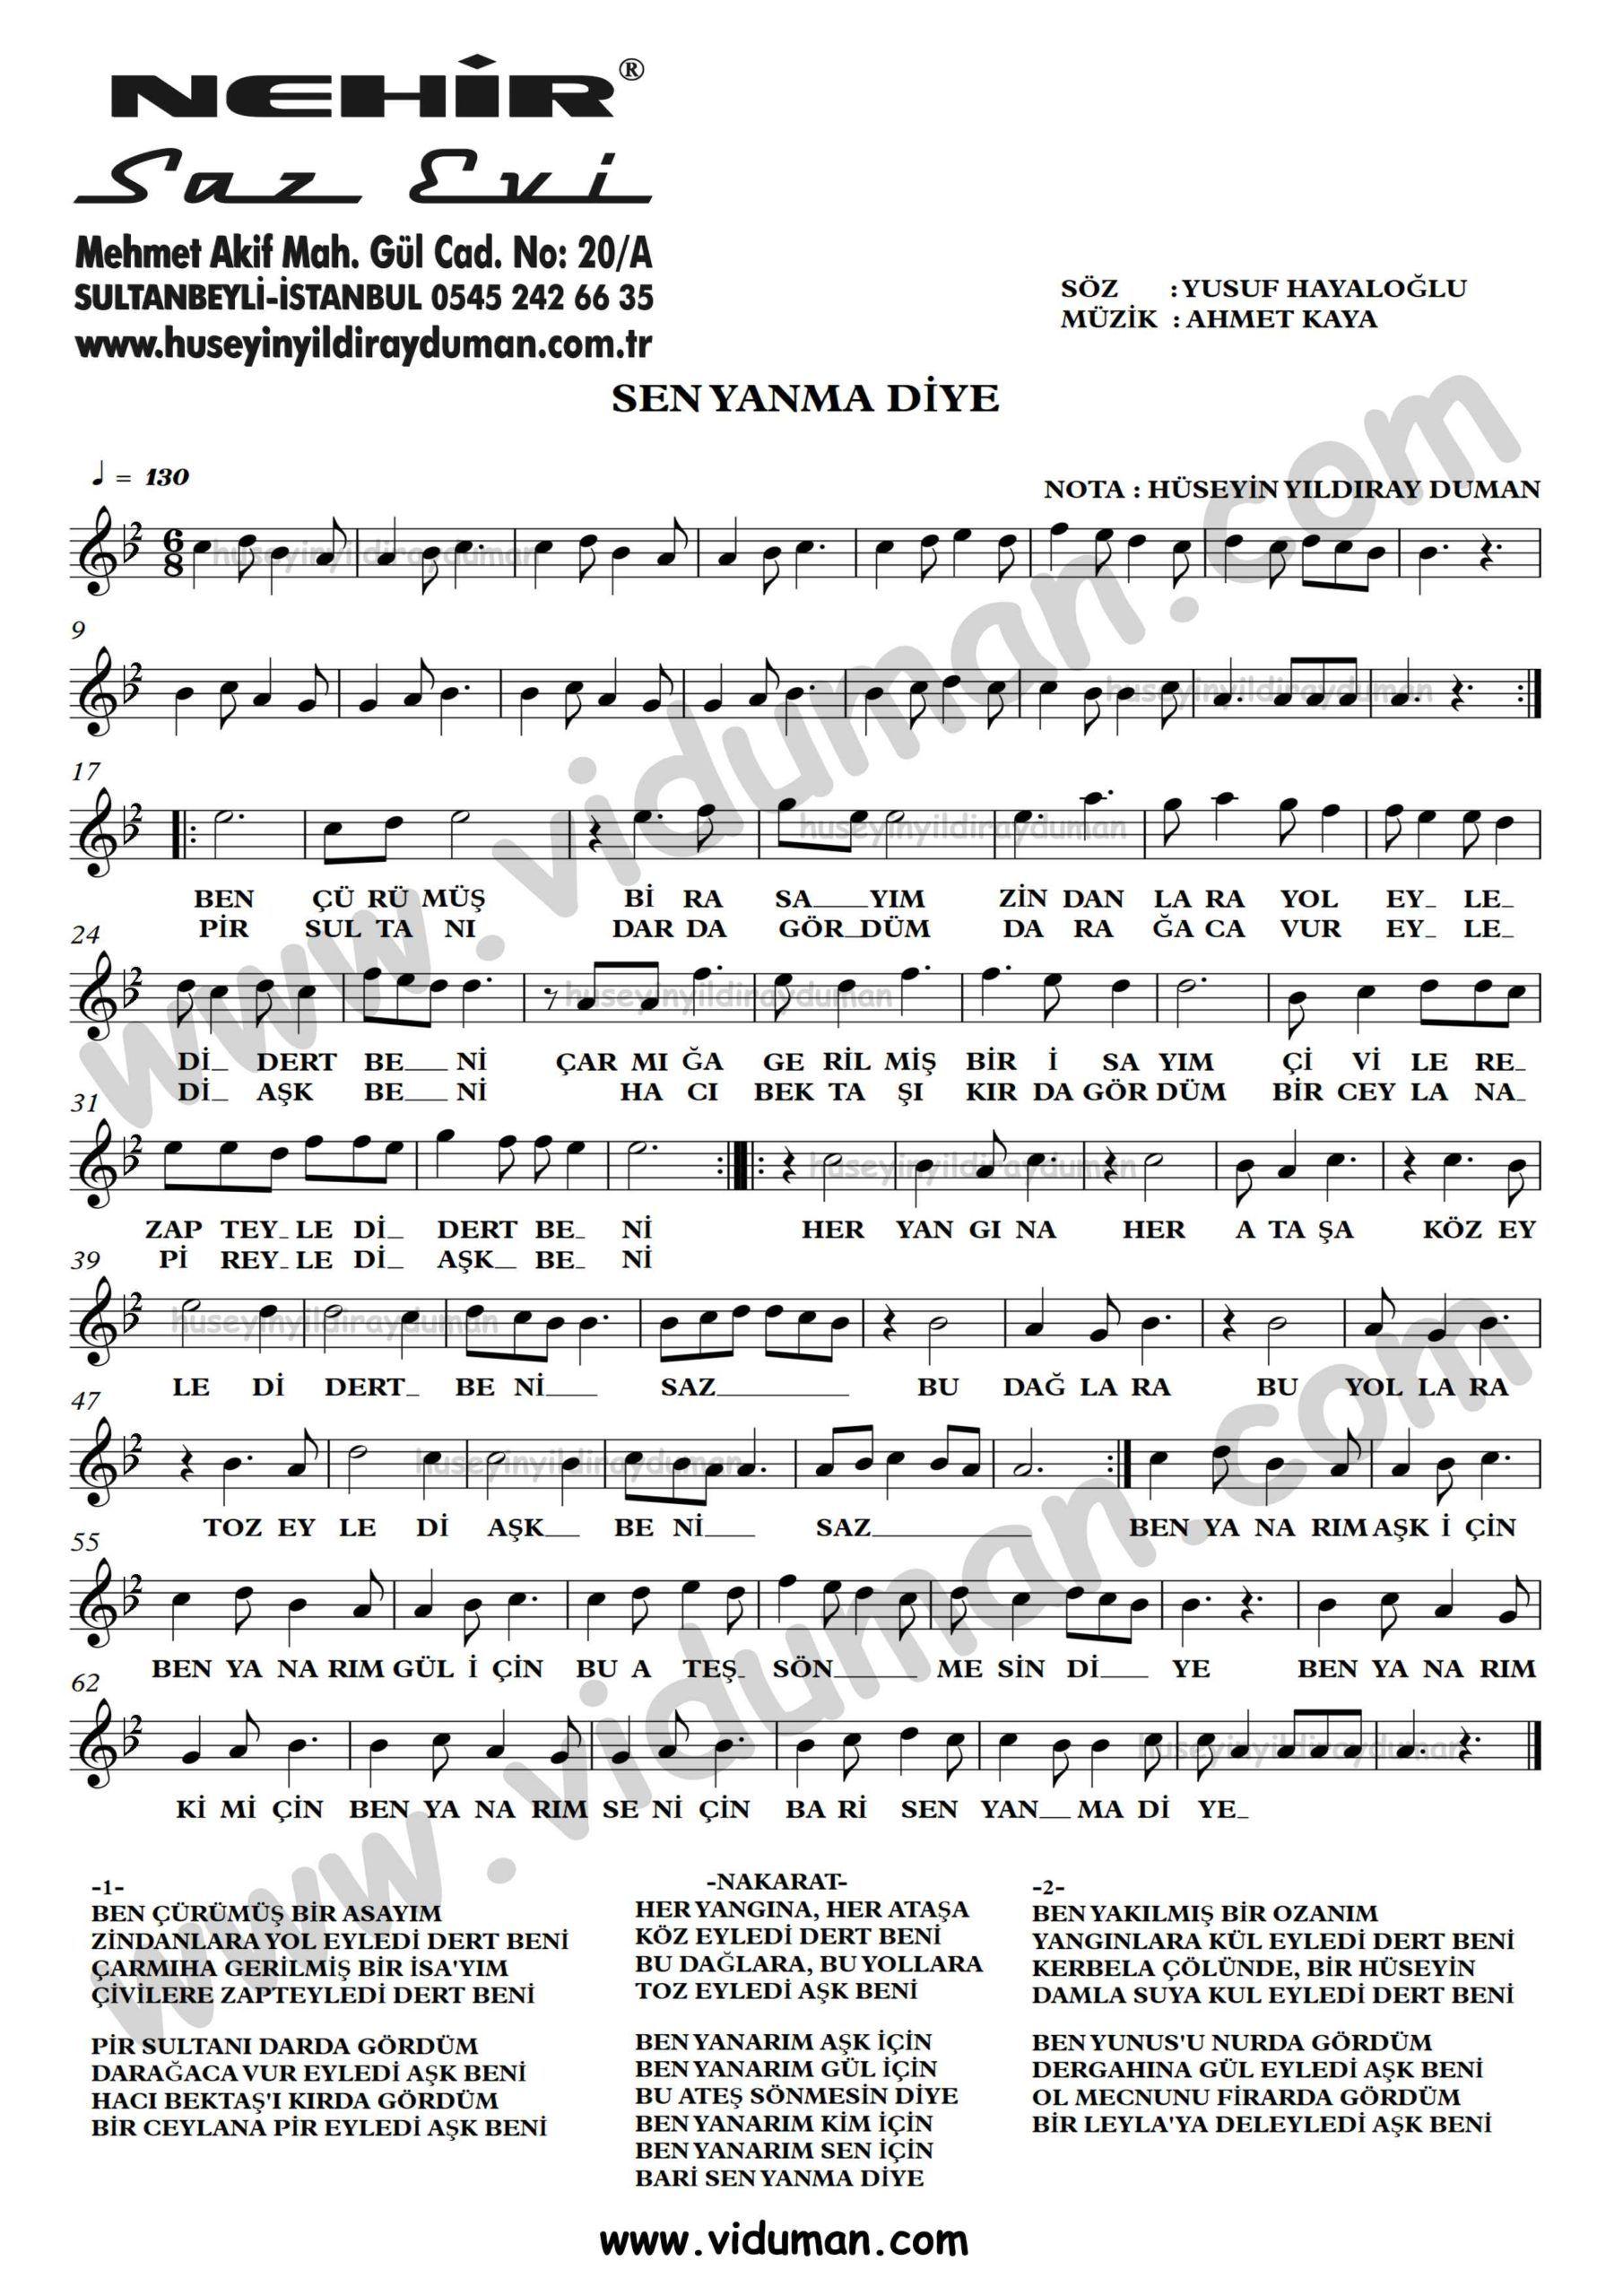 Sen Yanma Diye Ahmet Kaya Nota Baglama Saz Turku Notalari Muzik Notalari Muzik